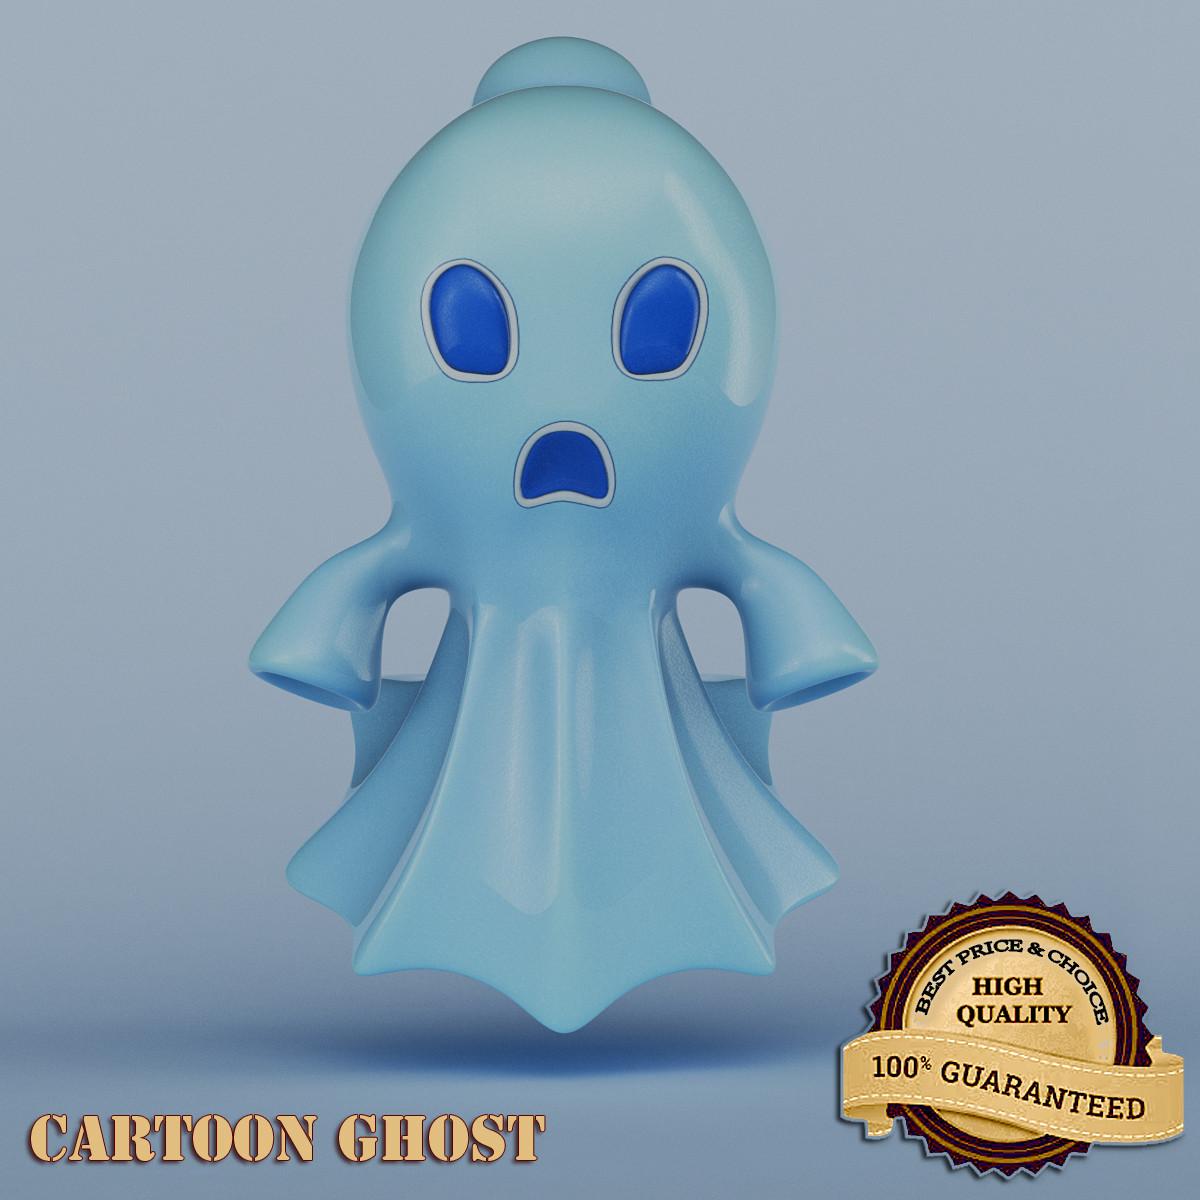 005_Cartoon Ghost.jpg